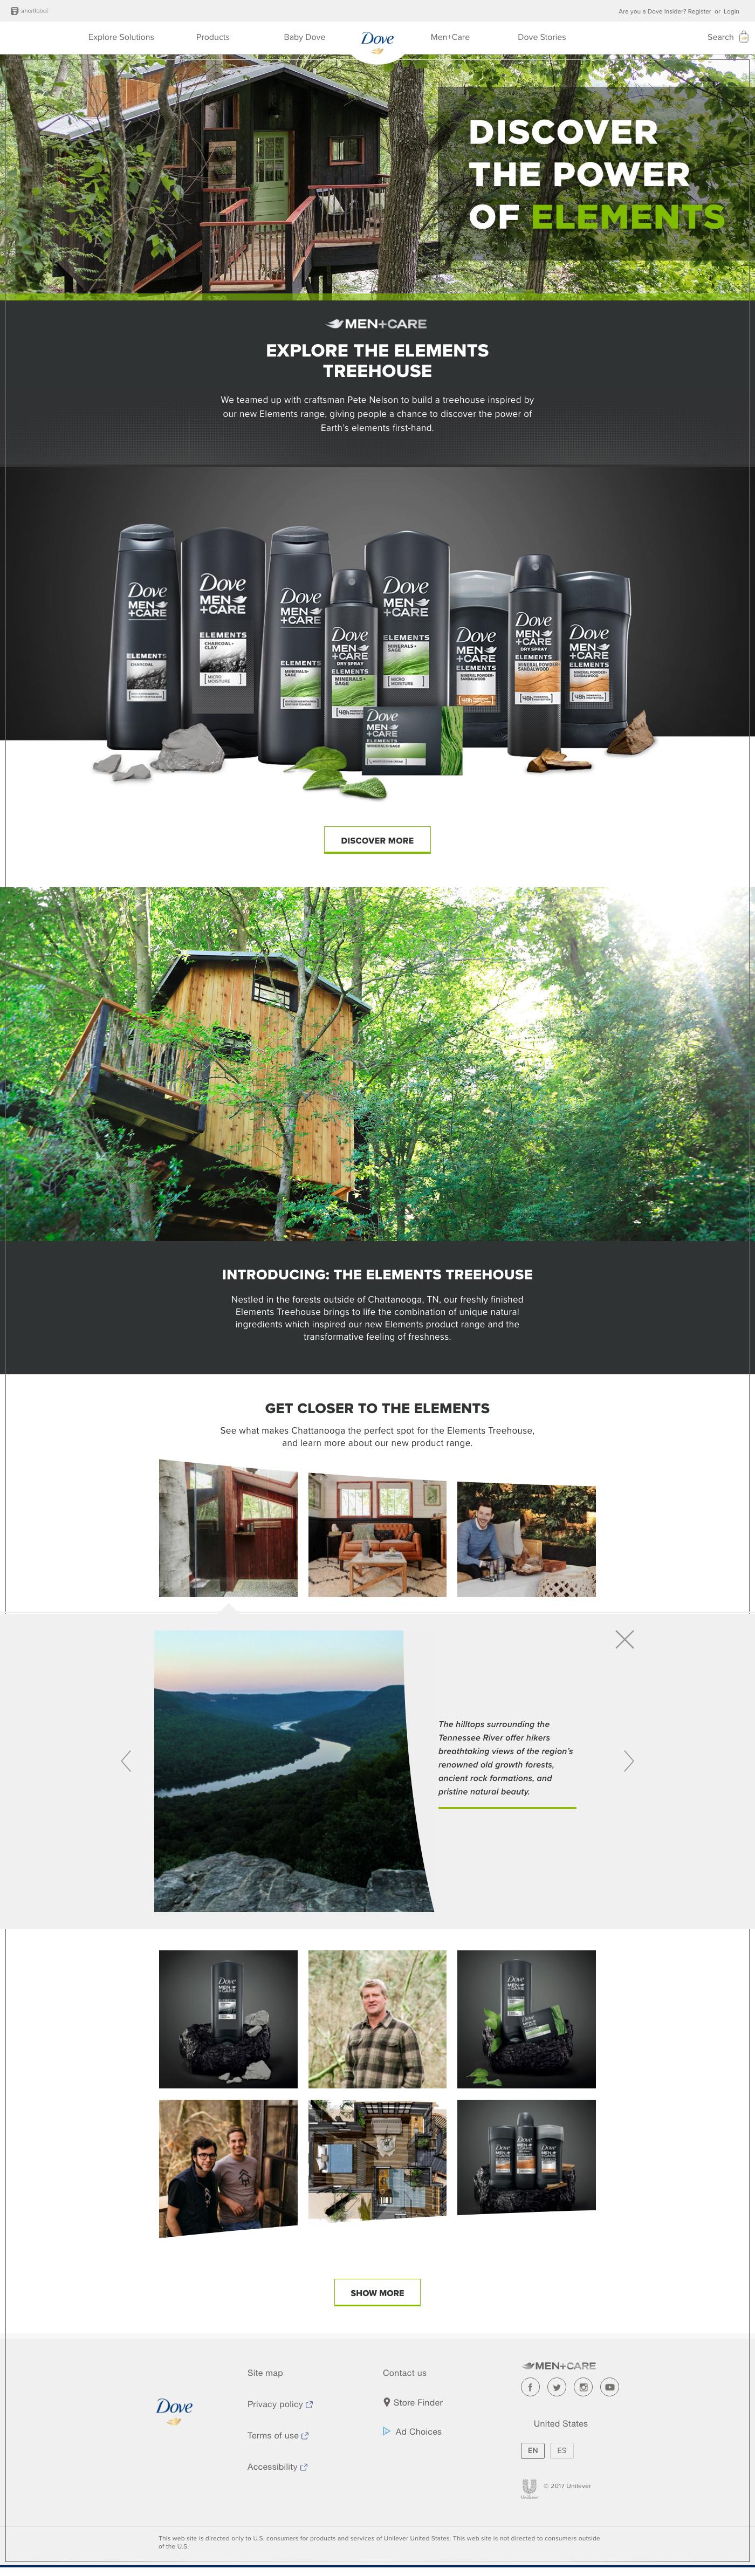 treehouse-psdb.jpg